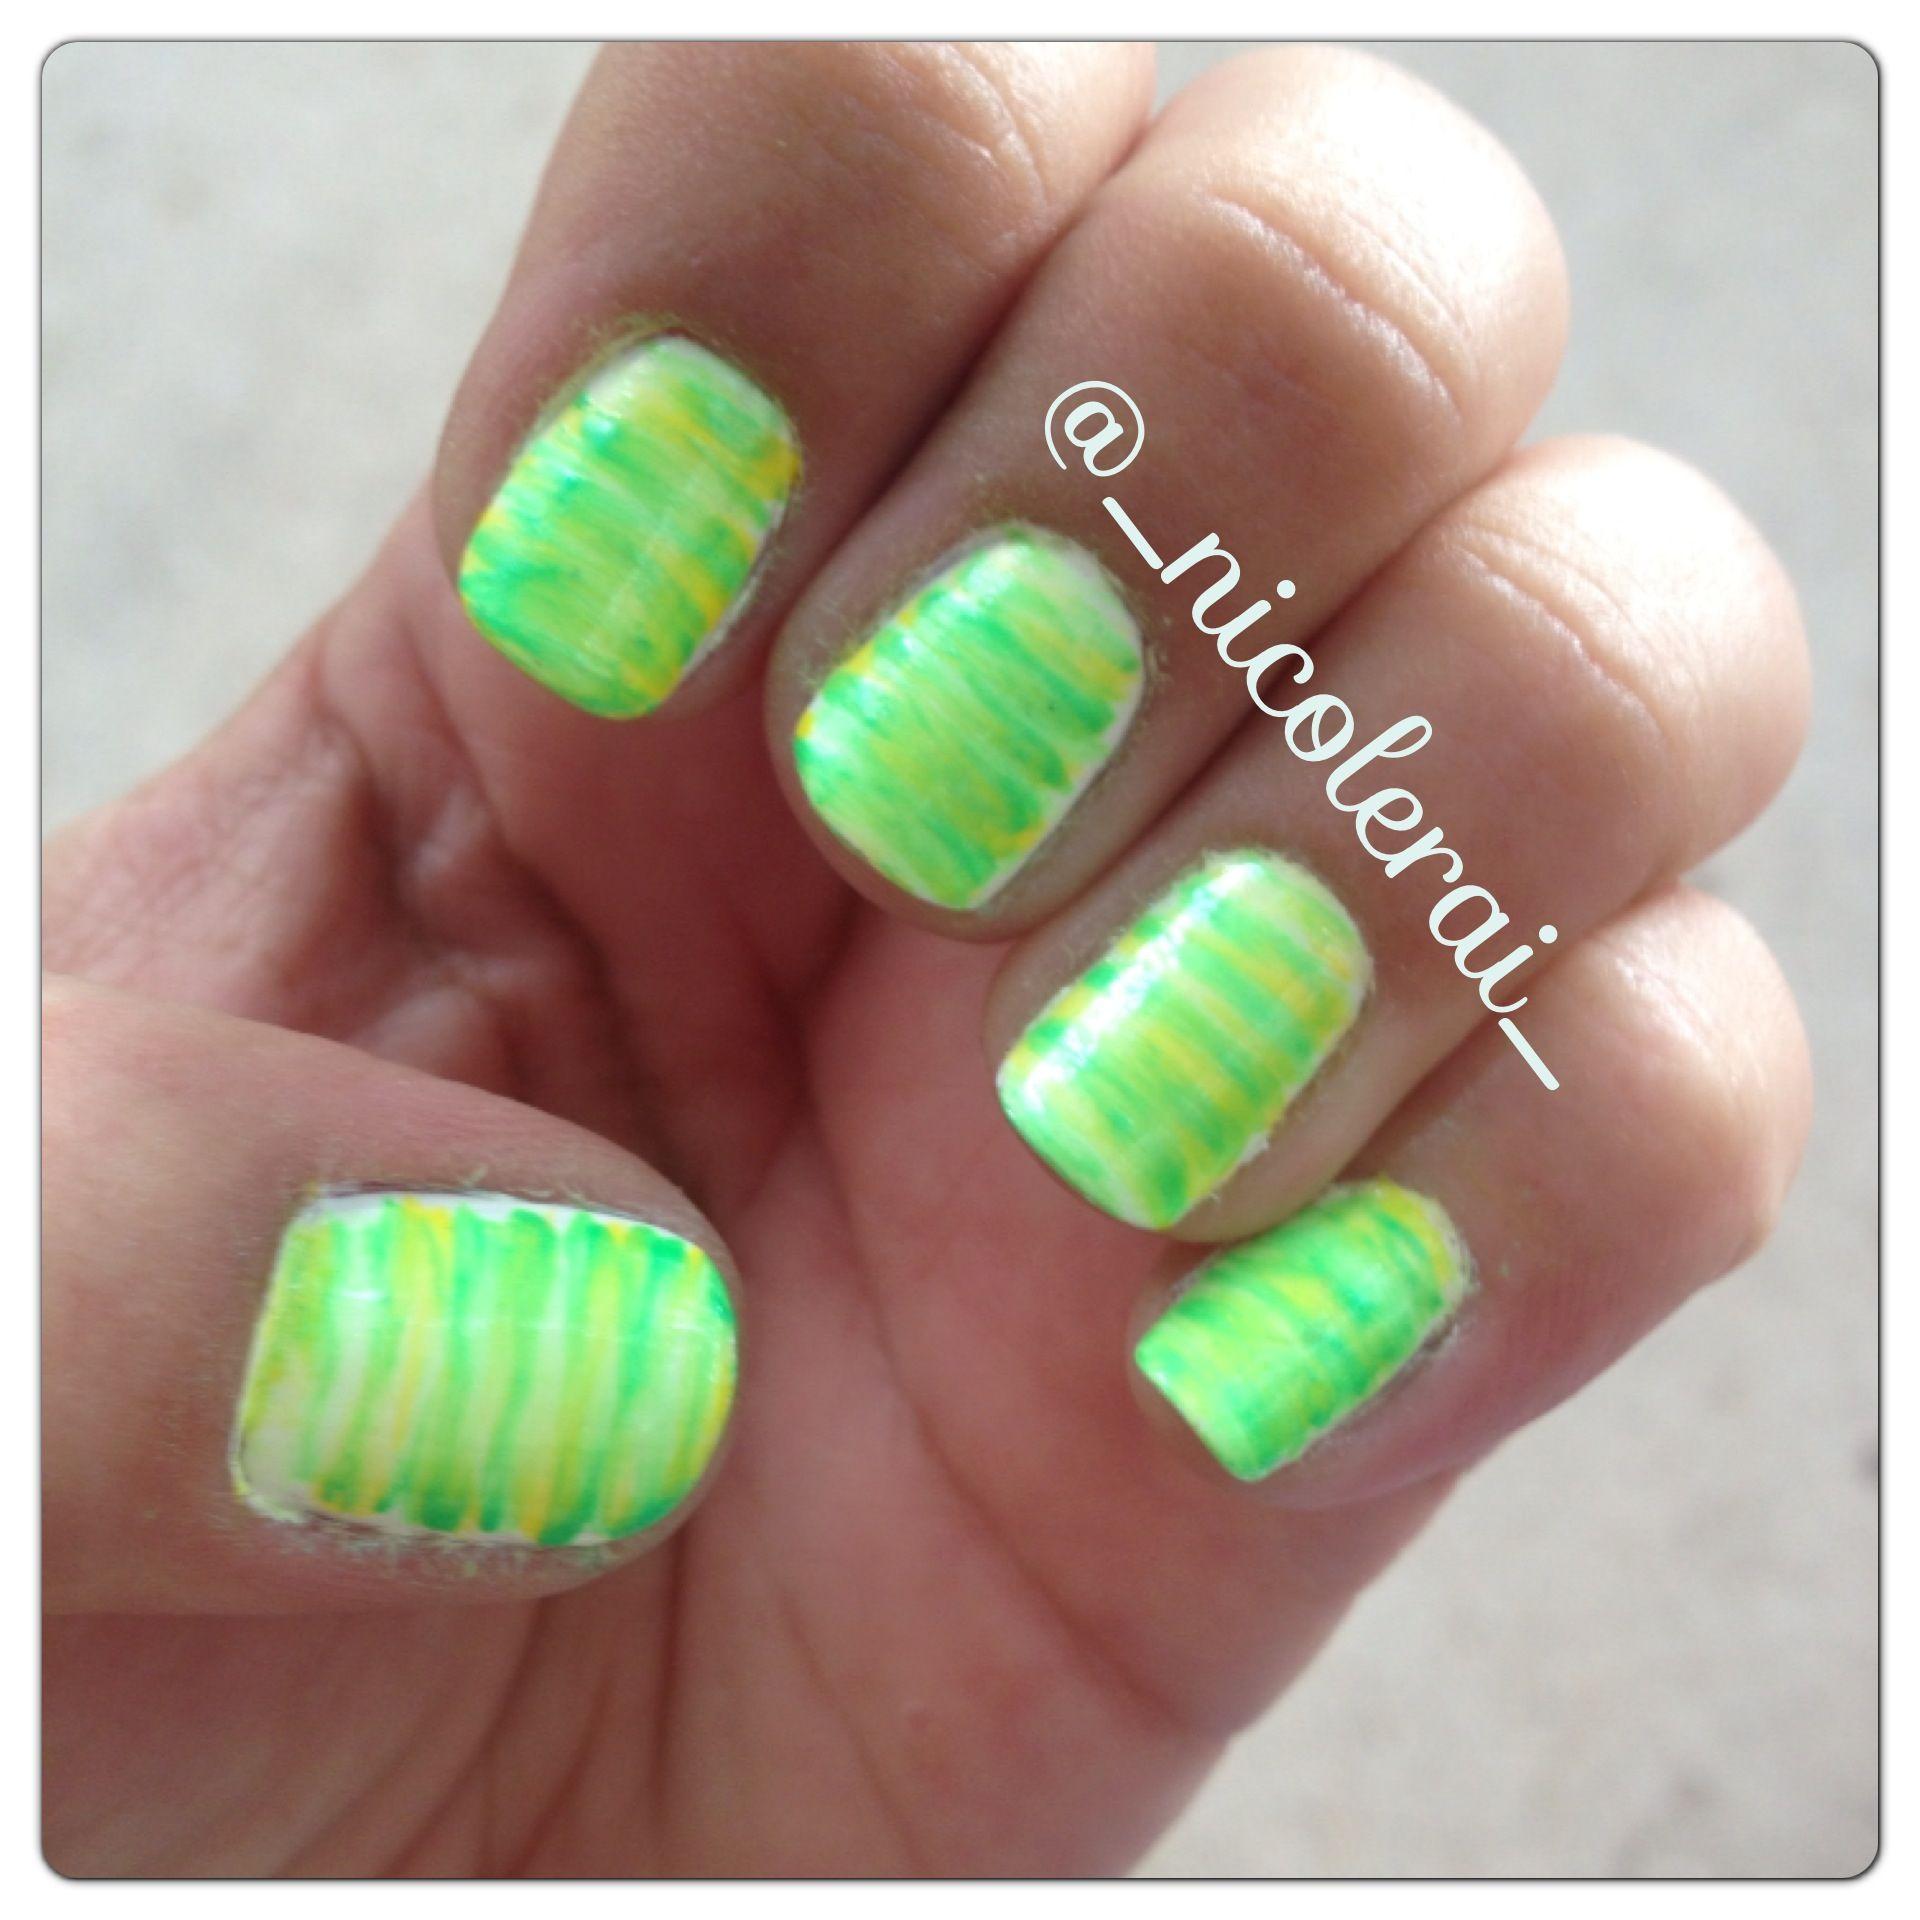 Fan Brush Nail Art #fanbrush #fanbrushnails #brightnails @_ ...